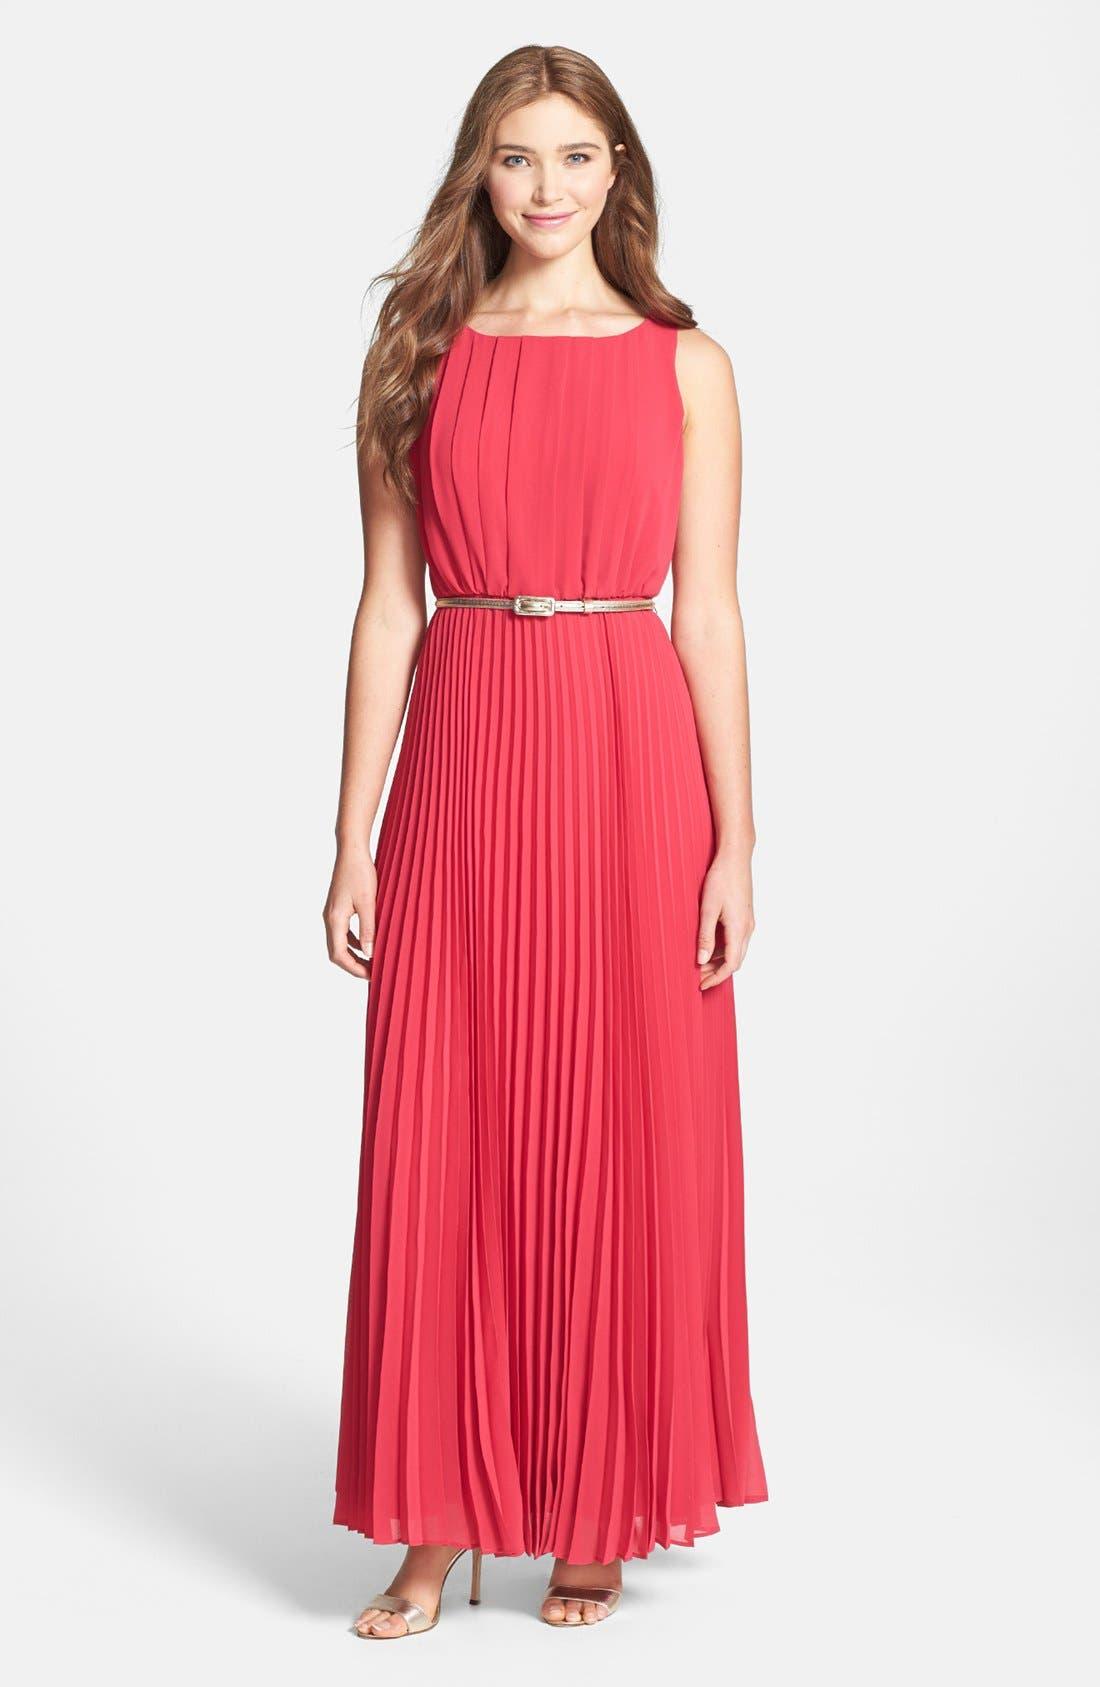 Alternate Image 1 Selected - Eliza J Pleated Chiffon Maxi Dress (Regular & Petite)